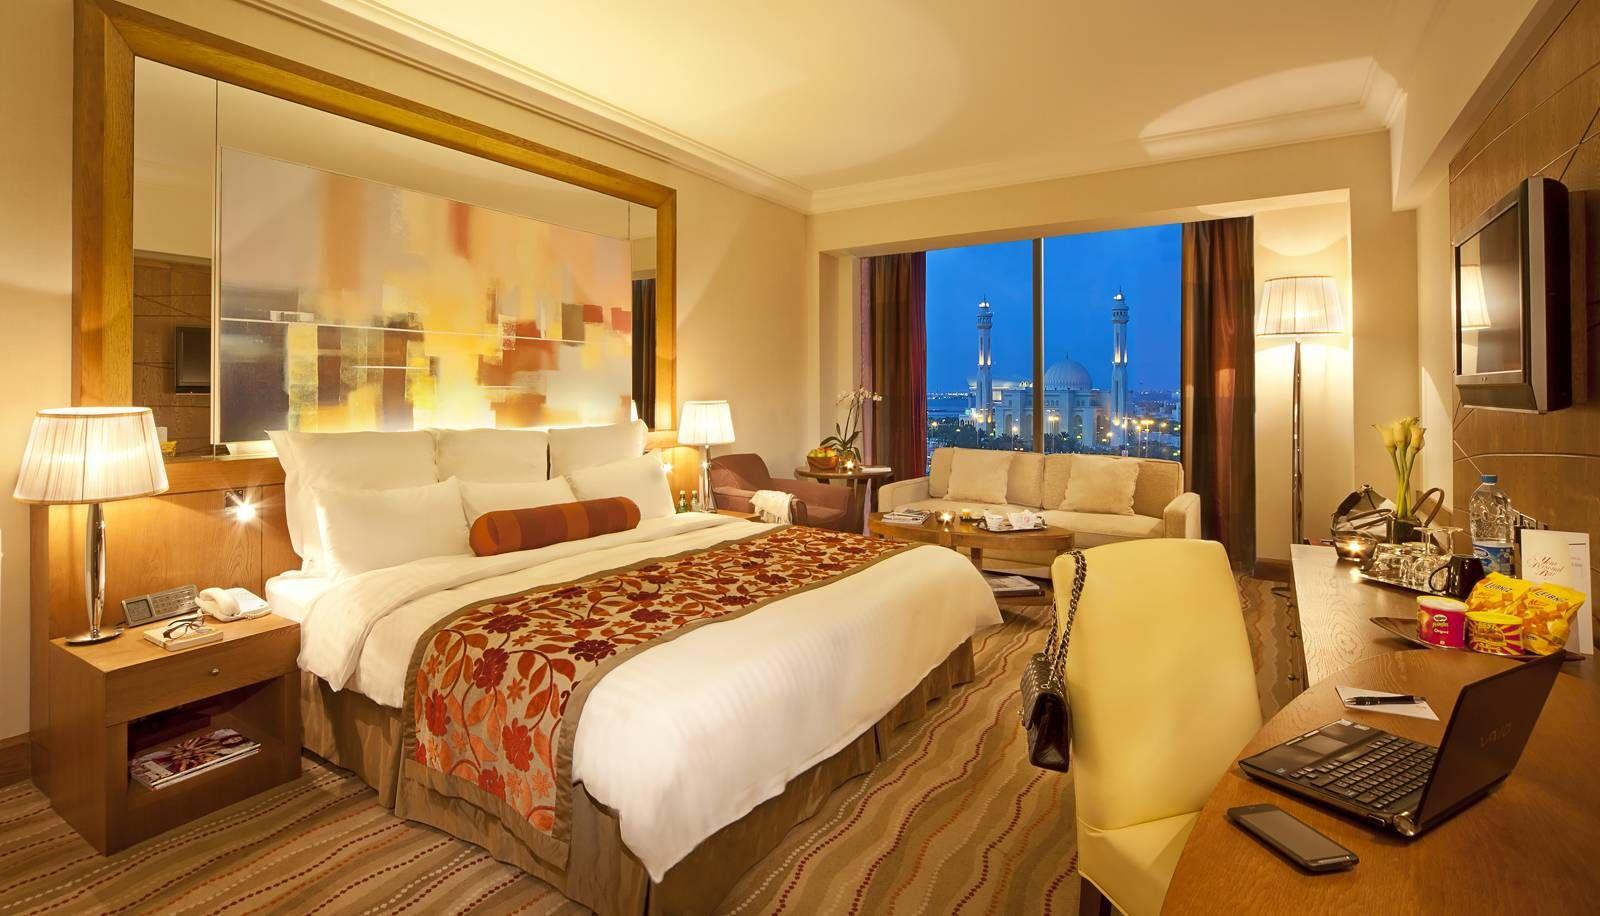 Luxury 4 Star Hotels Hotel Bedroom Design Room Home